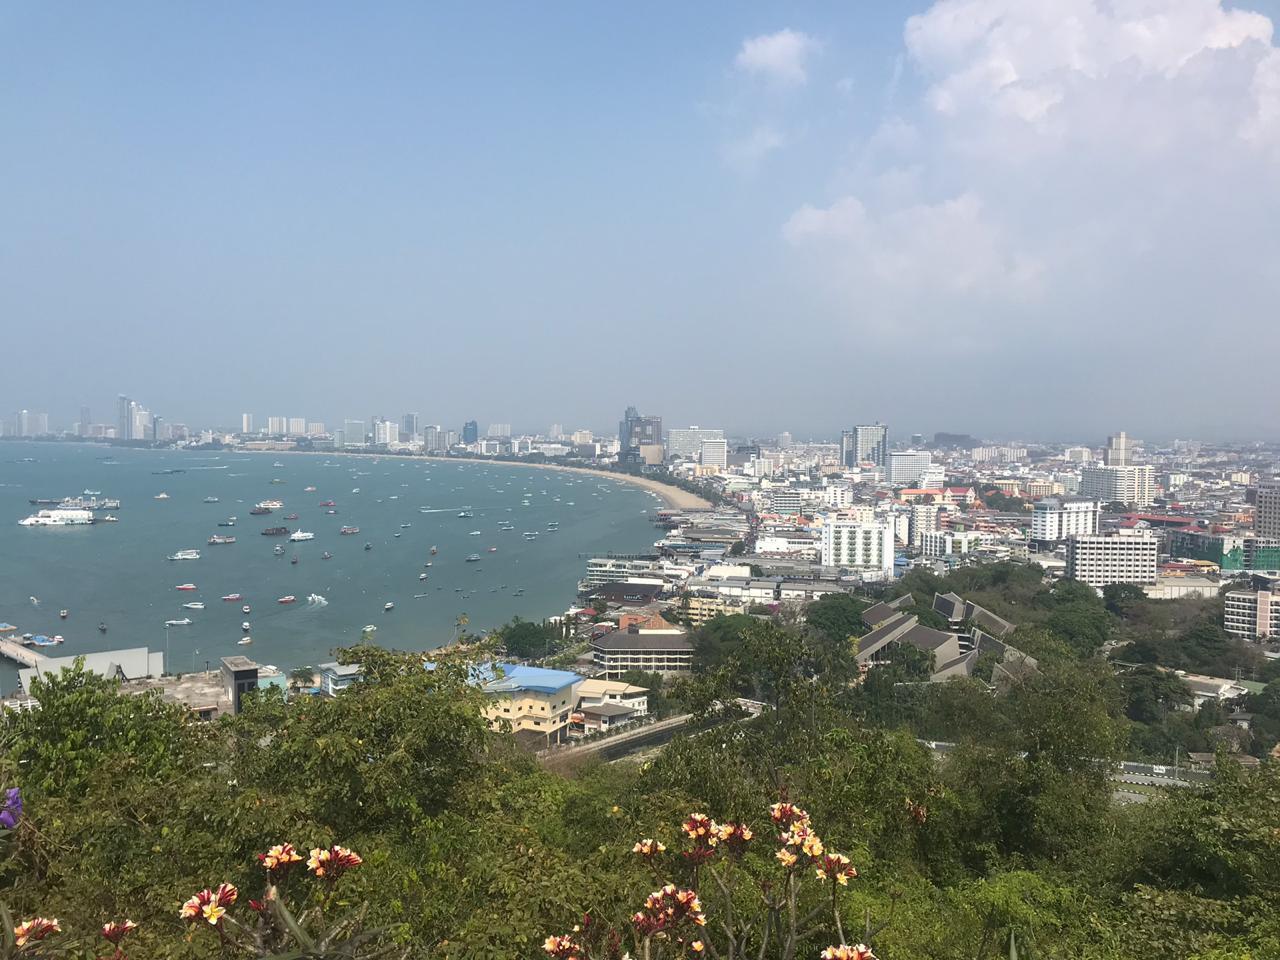 Куда уехать приморцу: Таиланд снизил налог на недвижимость на 90%